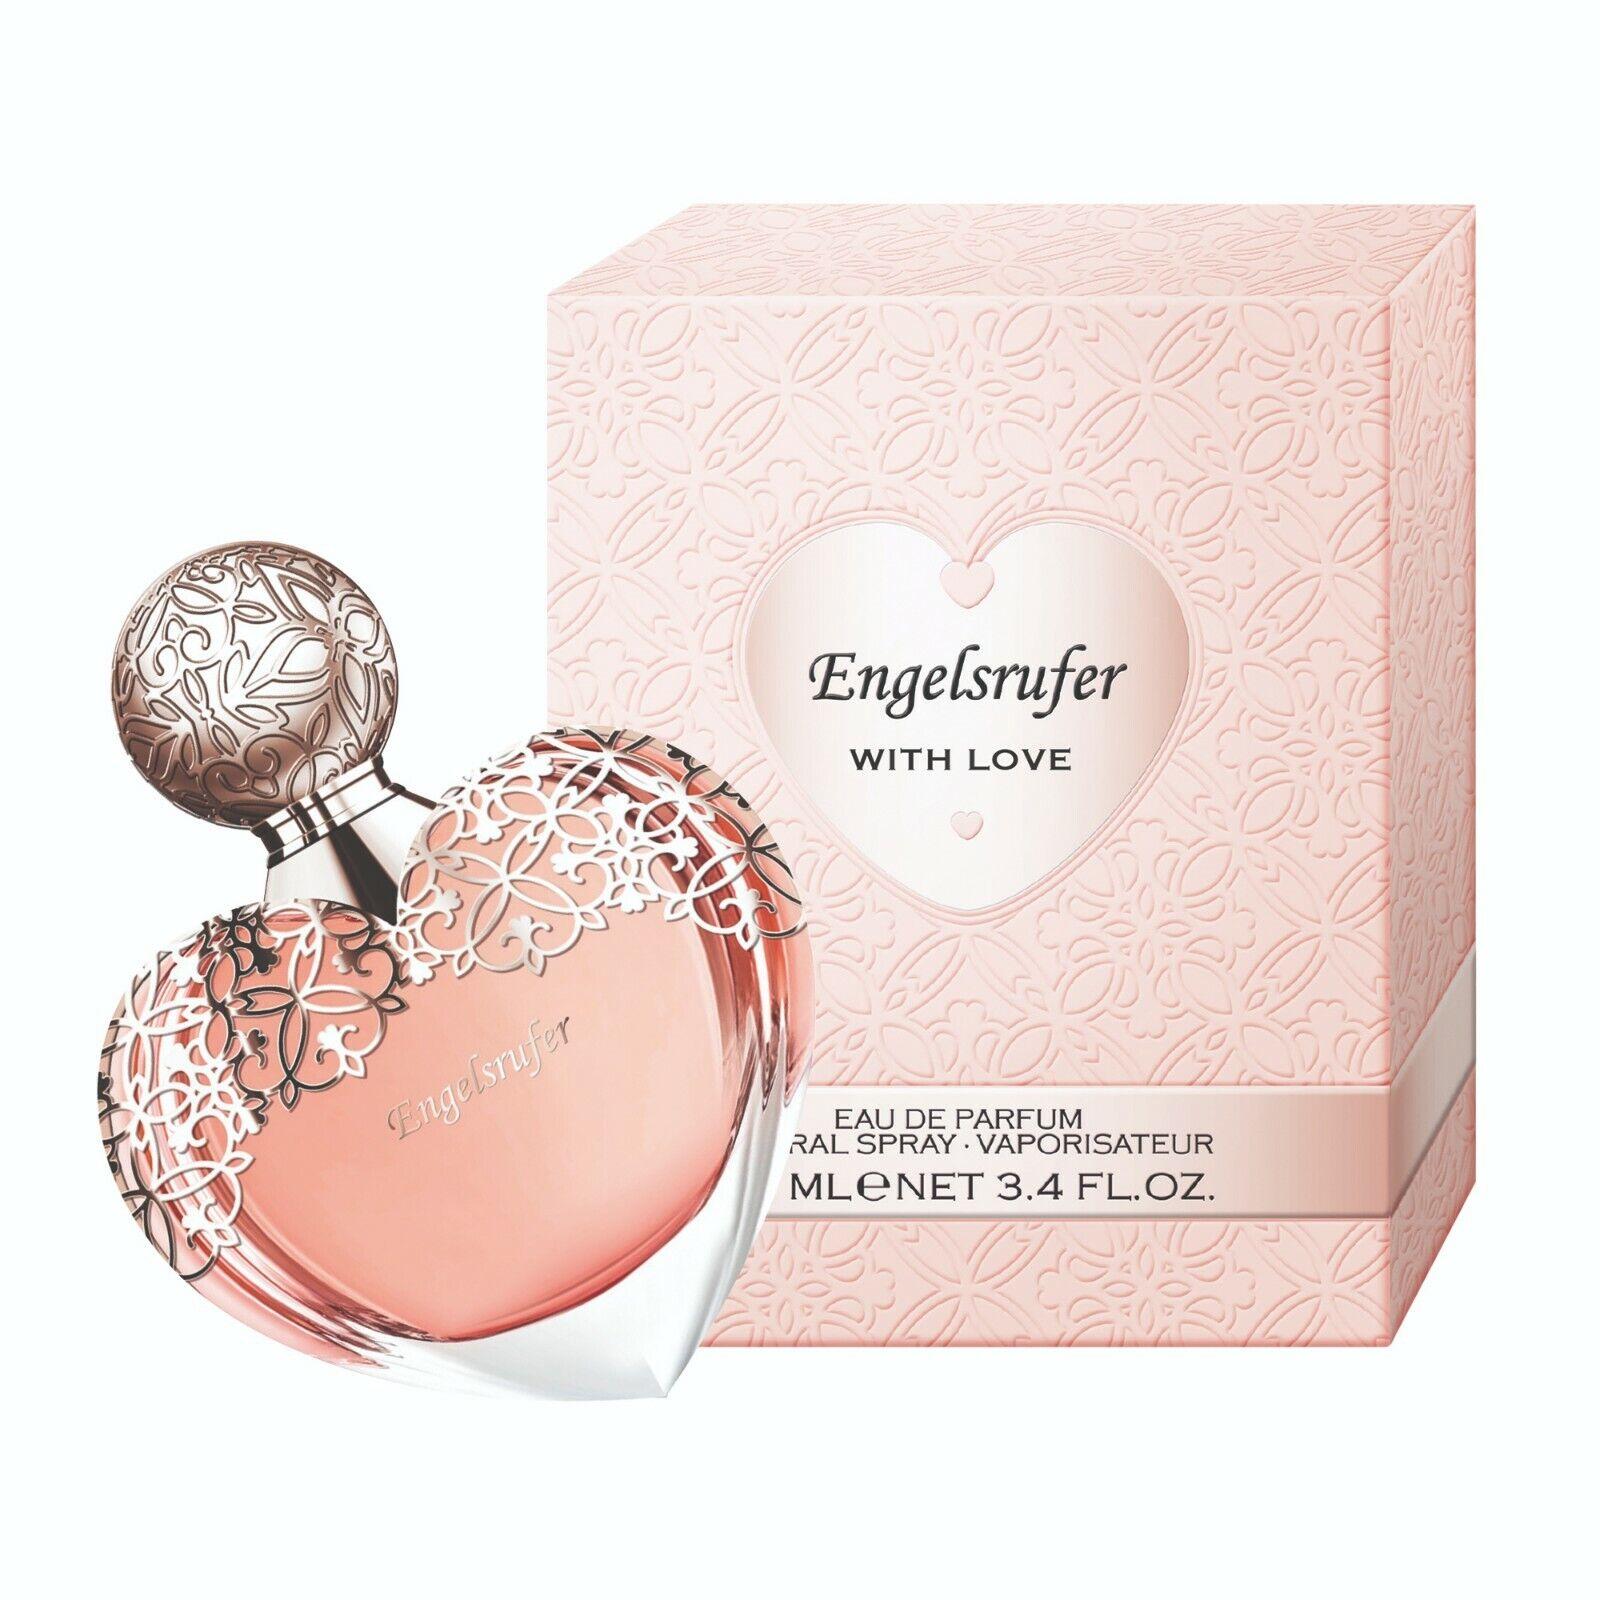 Engelsrufer With Love 100 ml Eau de Parfum EDP women Damen *B-WARE*